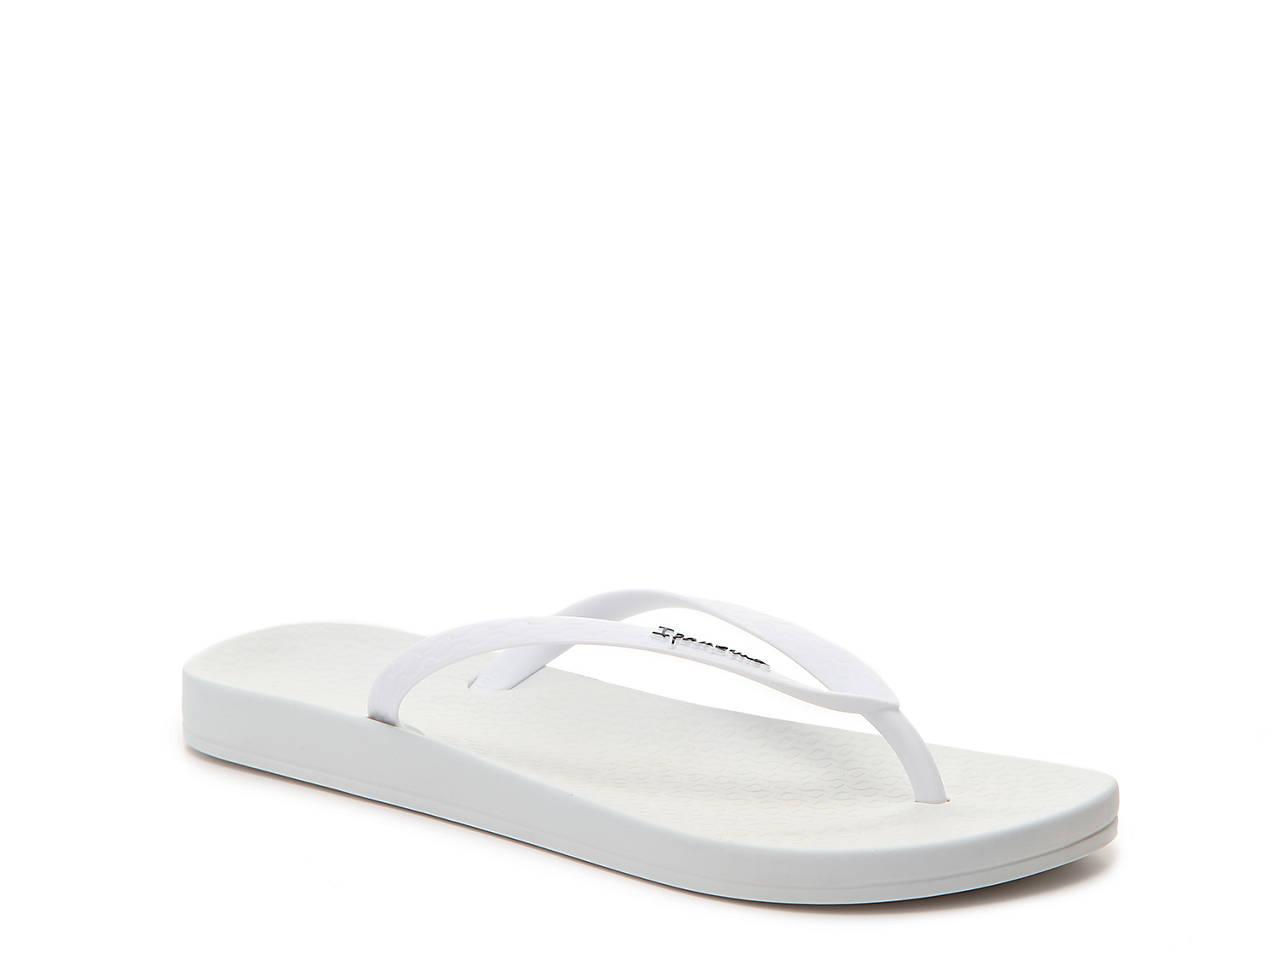 bd30ea74c06 Ipanema Ana Tan Flip Flop Women s Shoes